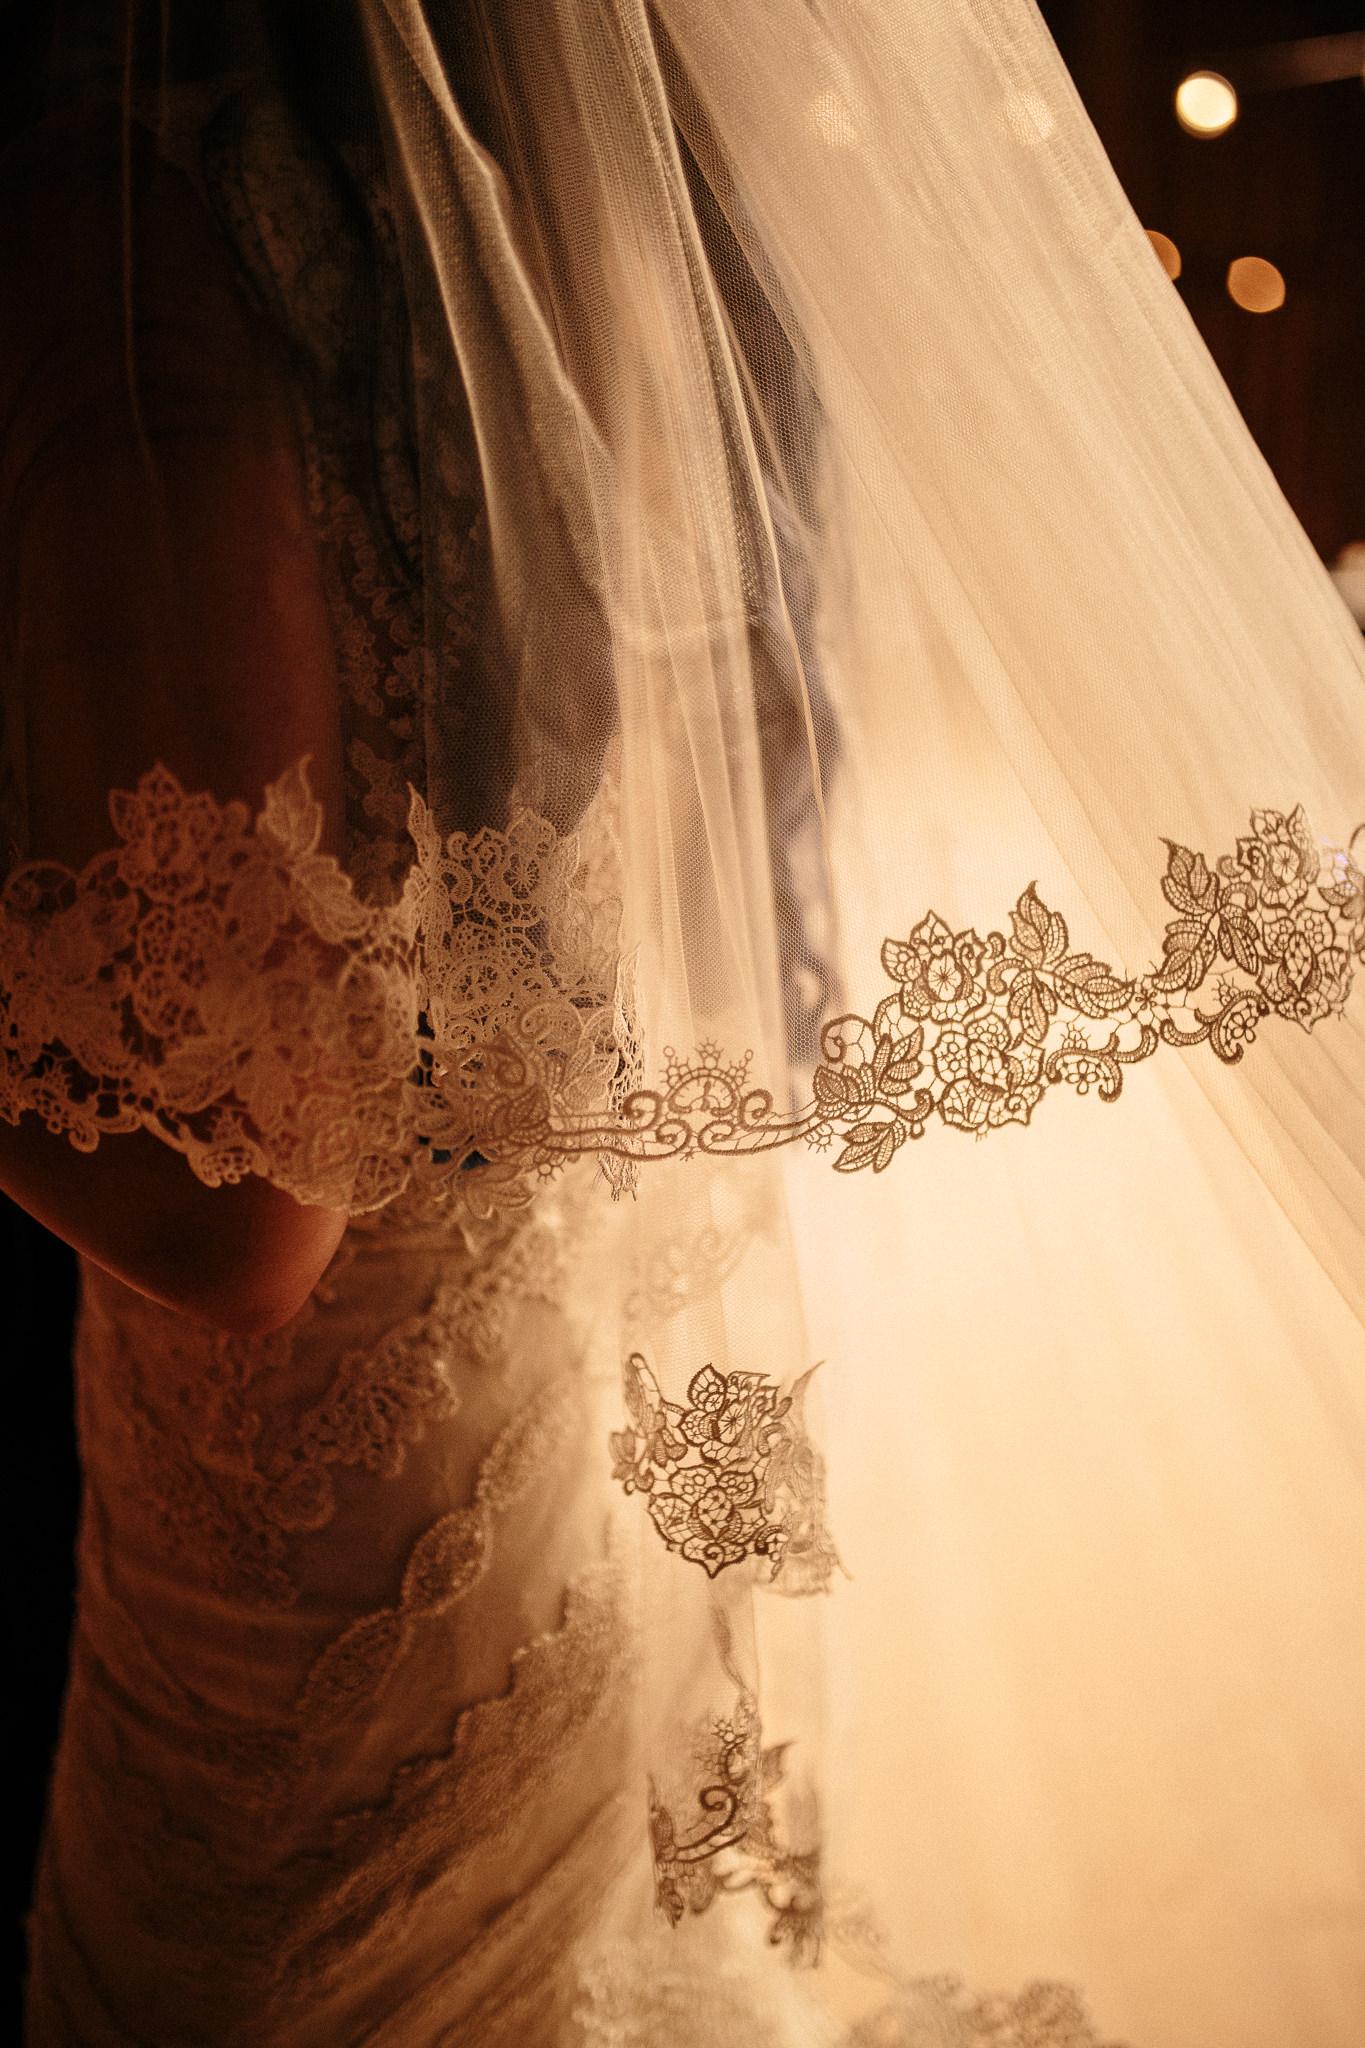 Ceren & Jani - Finland Wedding Photographer - Weddings by Qay - Wedding Photographer (93 of 166).jpg